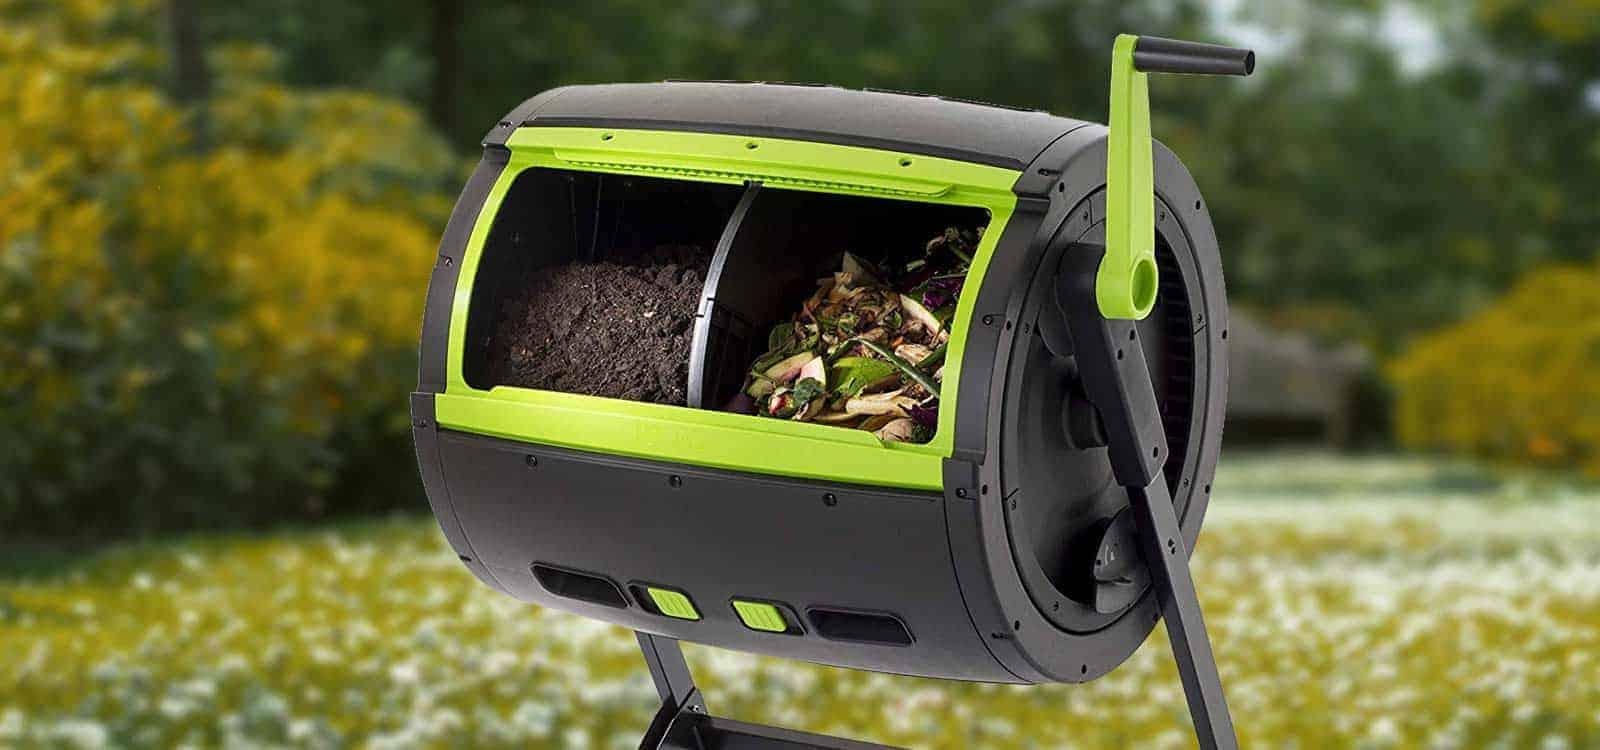 best-compost-bins-tumblers-worm-composting